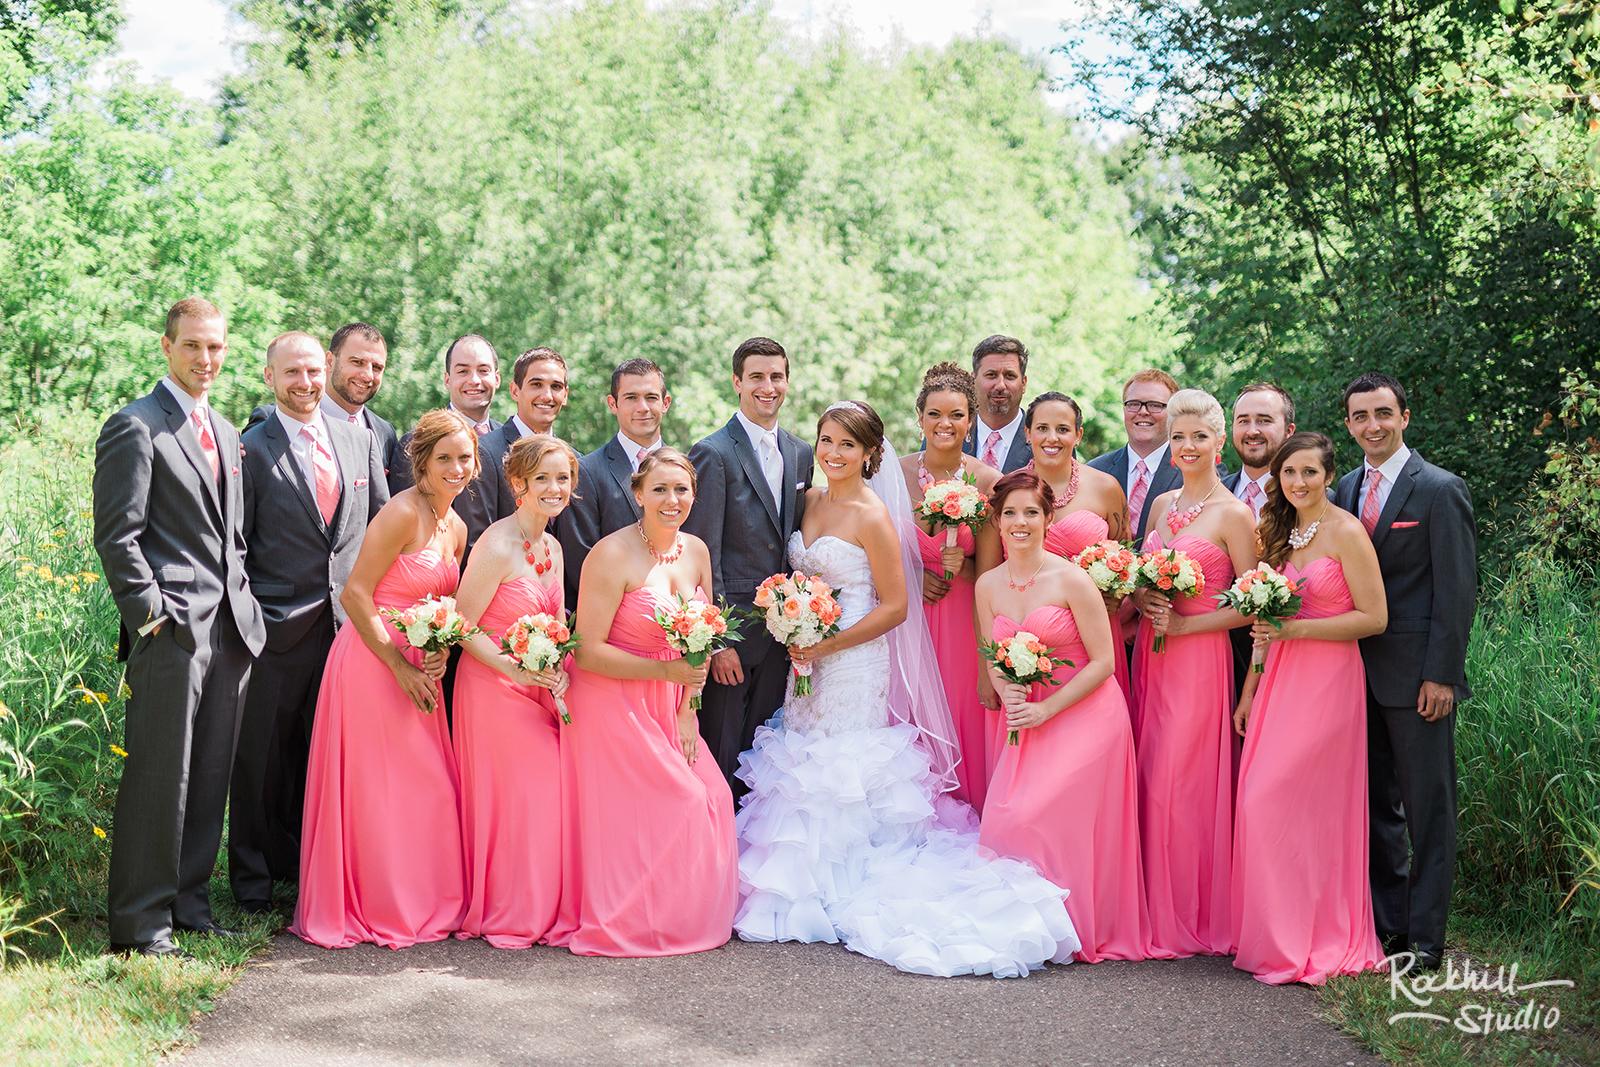 marquette-wedding-upper-peninsula-northern-michigan-wedding-ck-photography-wedding-party-1.jpg